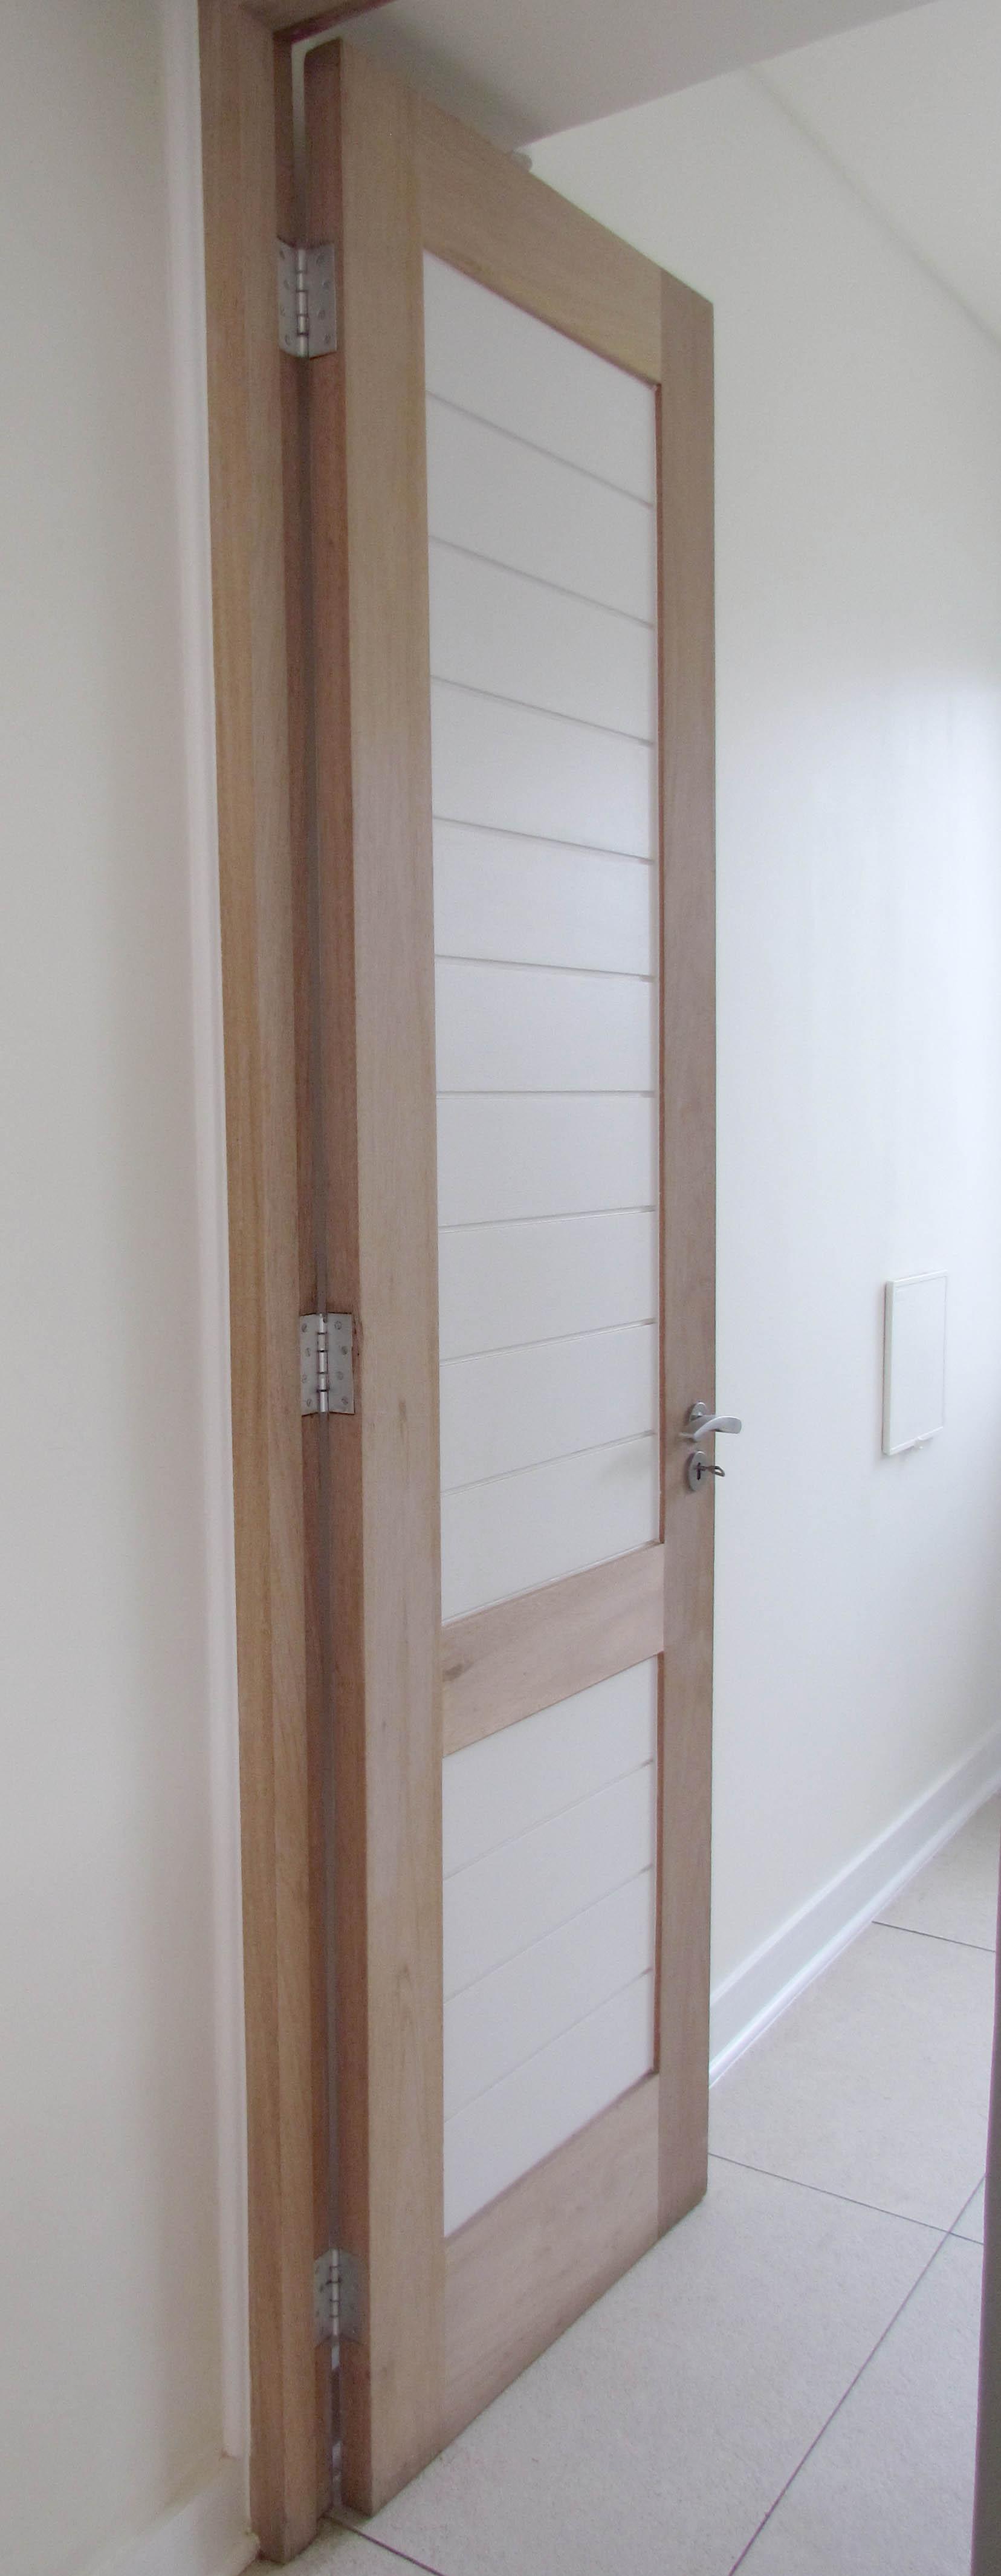 Solid wood interleading doors